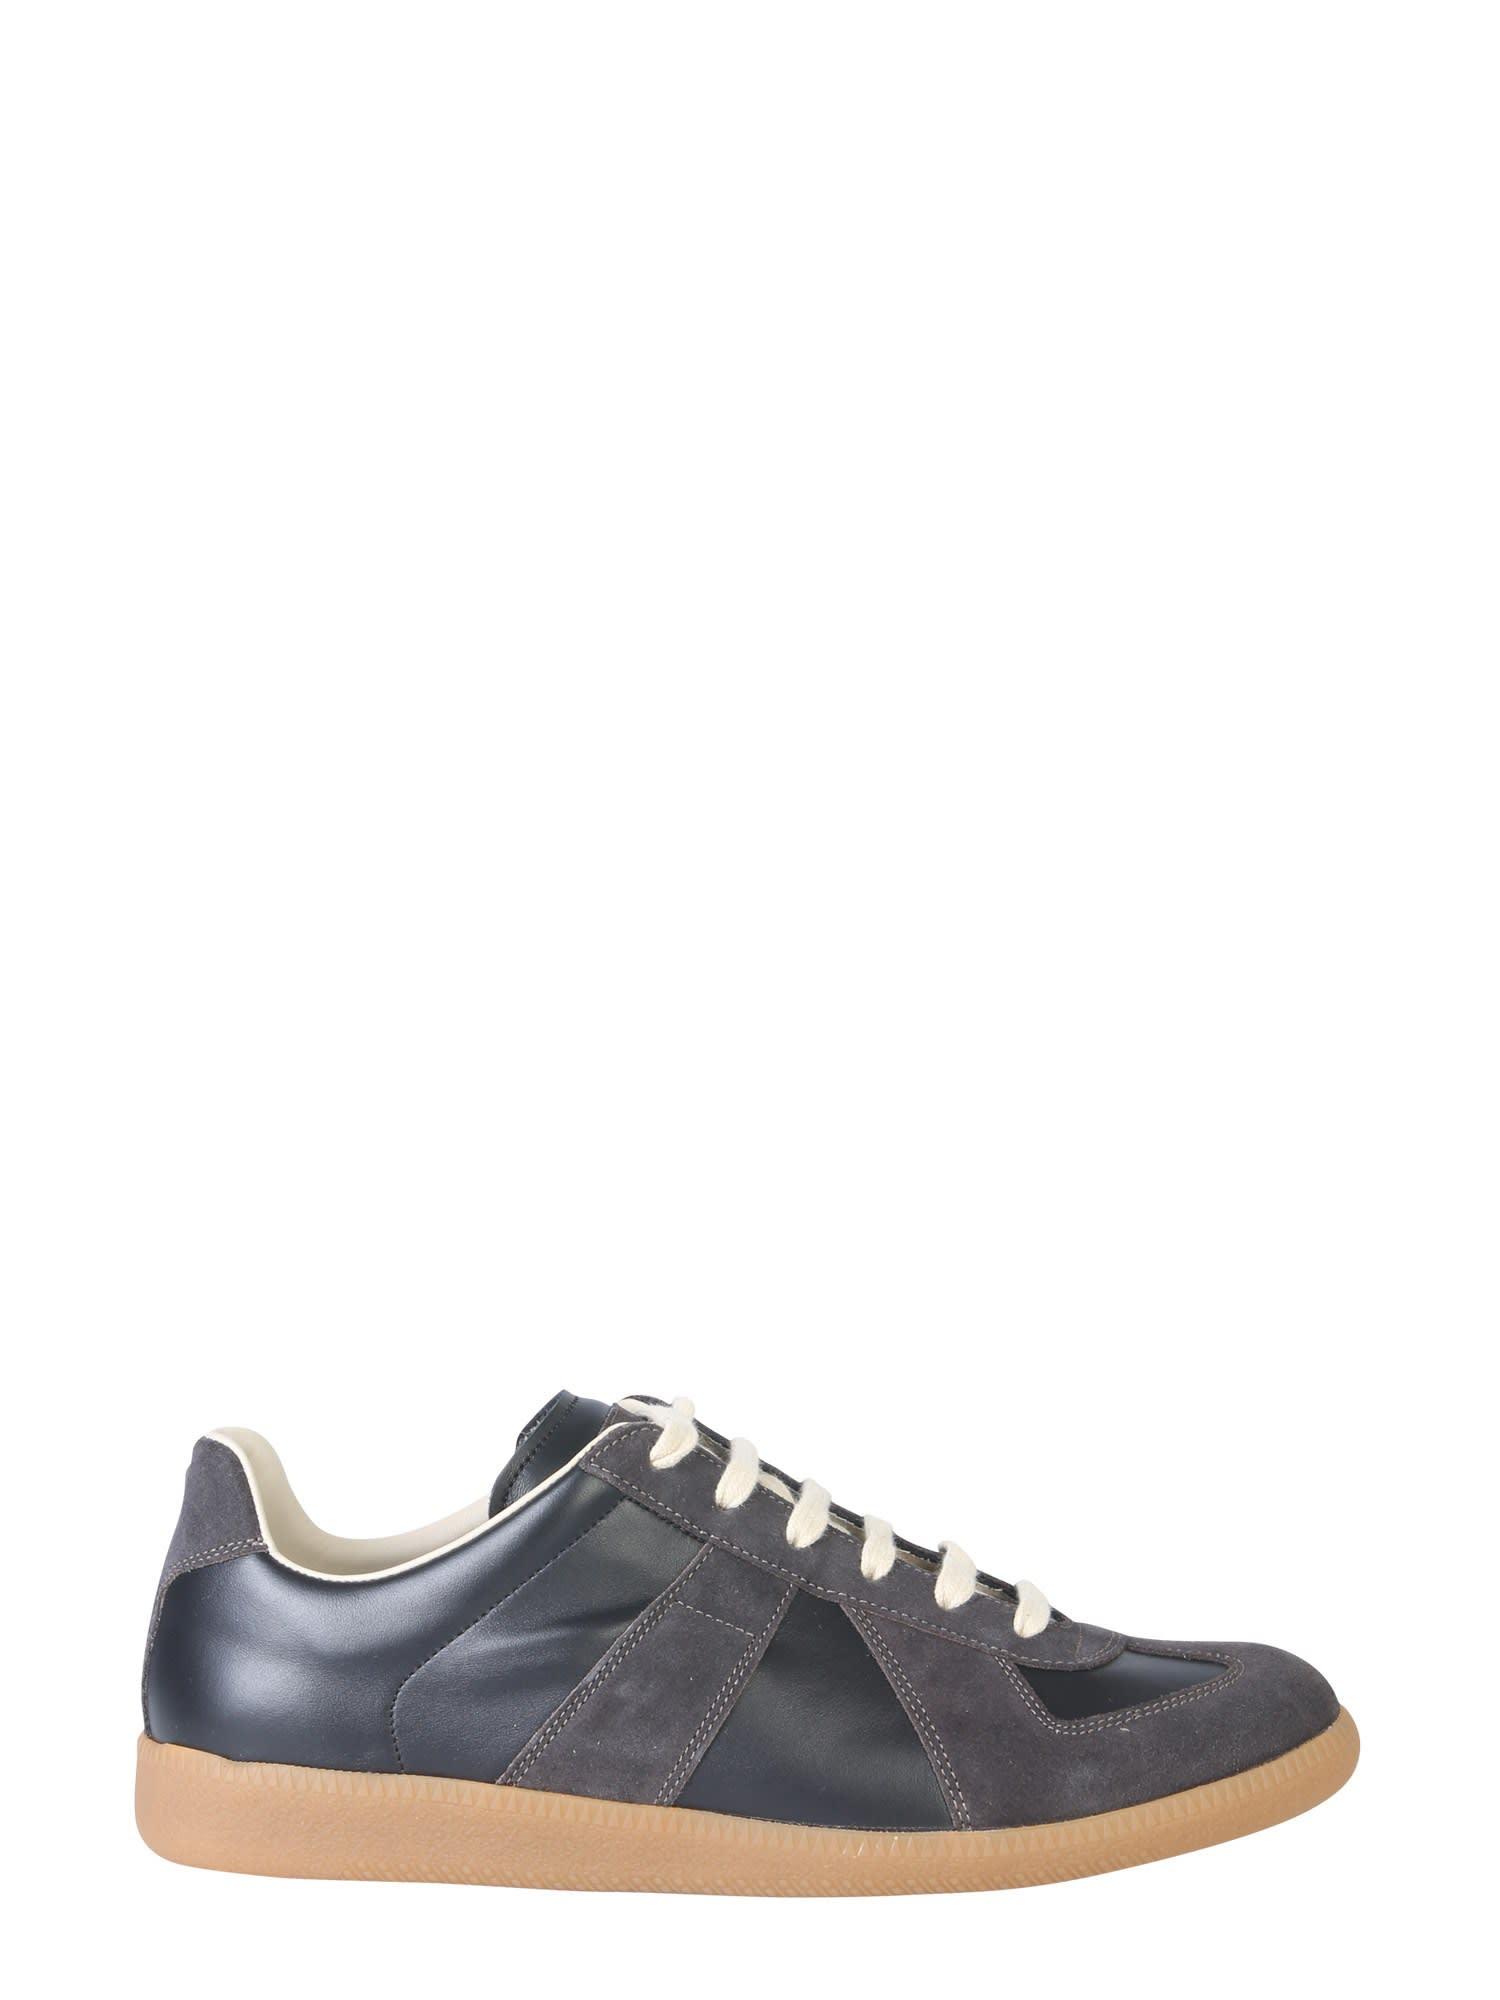 6d2dc3d63e6 Maison Margiela Replica Sneaker